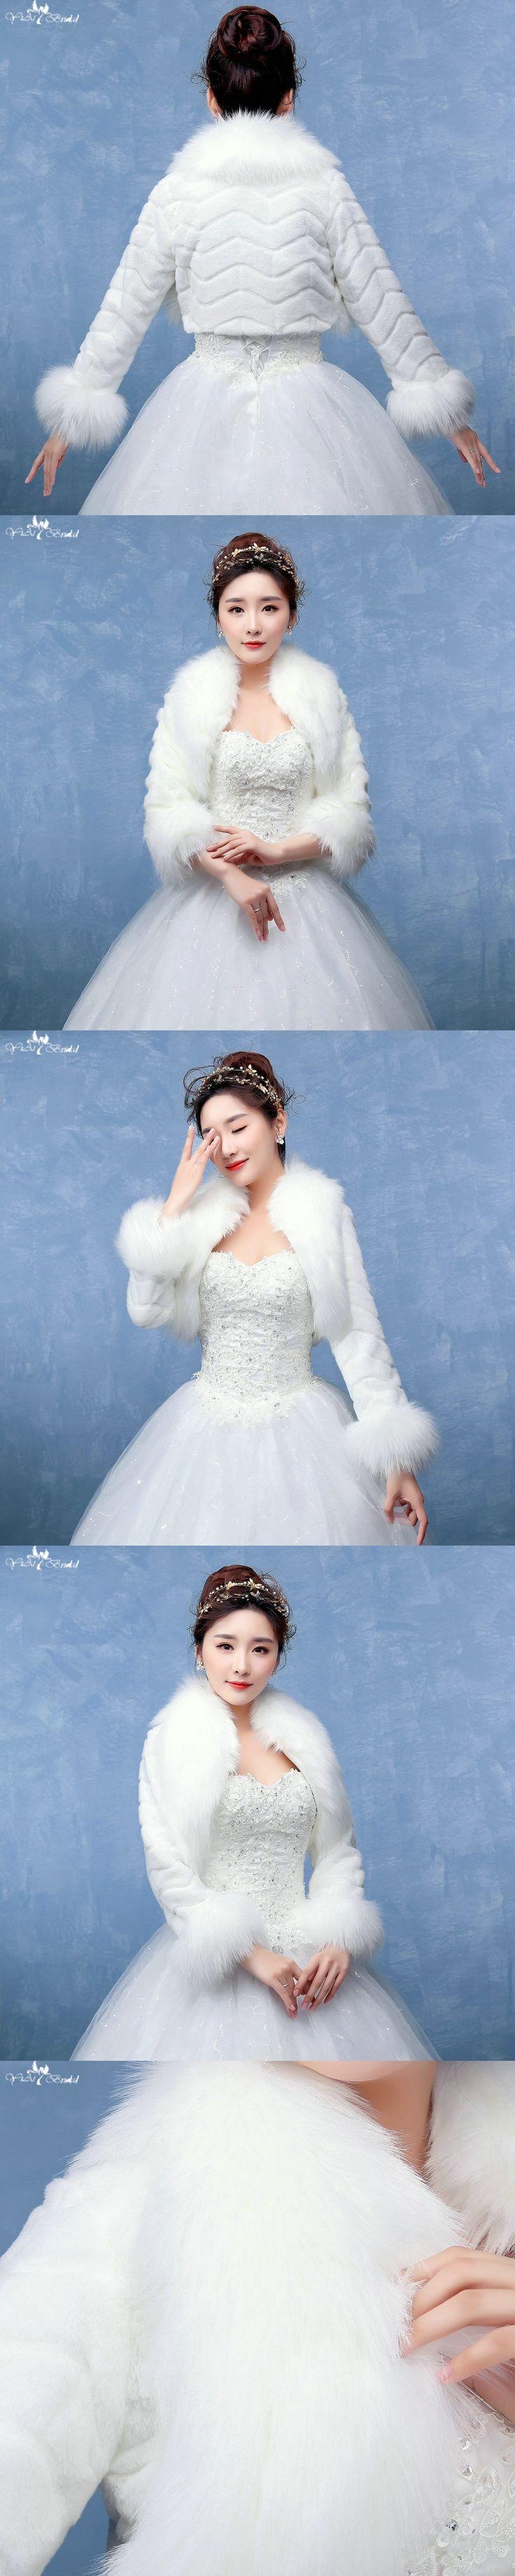 LZP131 Simple Wave Jacket Adult Long Sleeves Wedding Fur Bolero Women